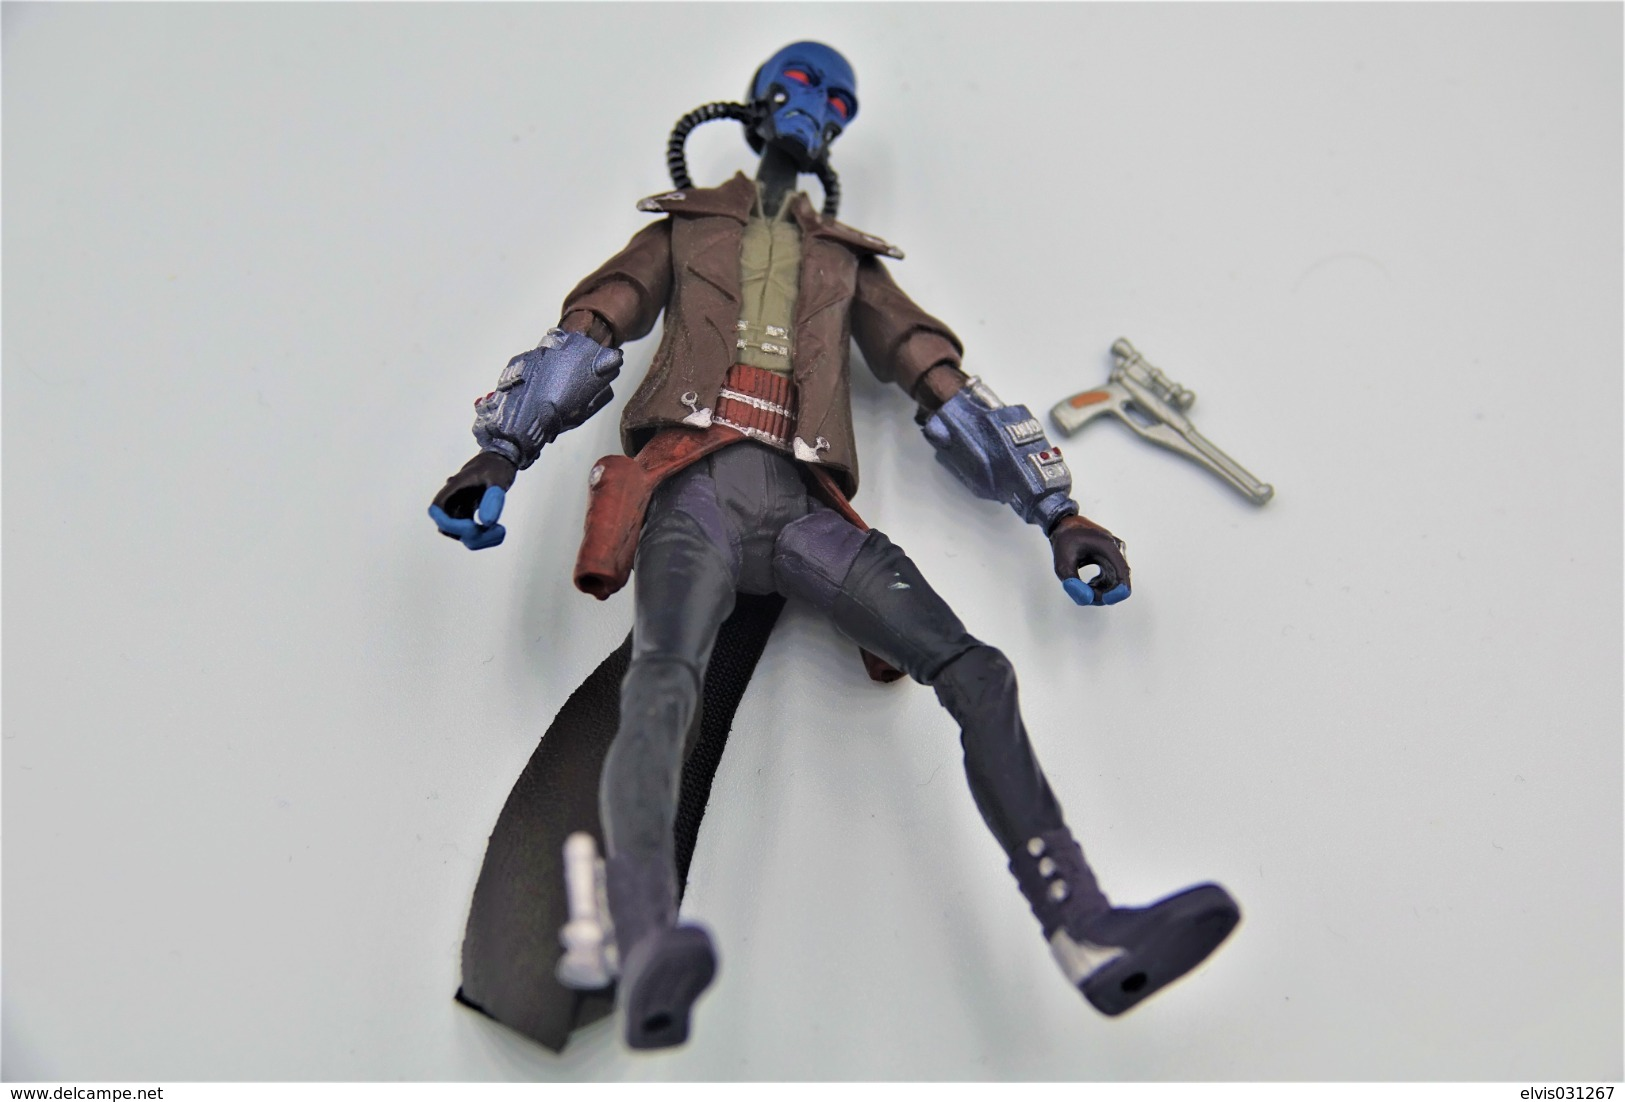 Vintage FIGURE : HASBRO Star Wars CW-22 Cad Bane - 2010 - RaRe  - Figuur - Figurines